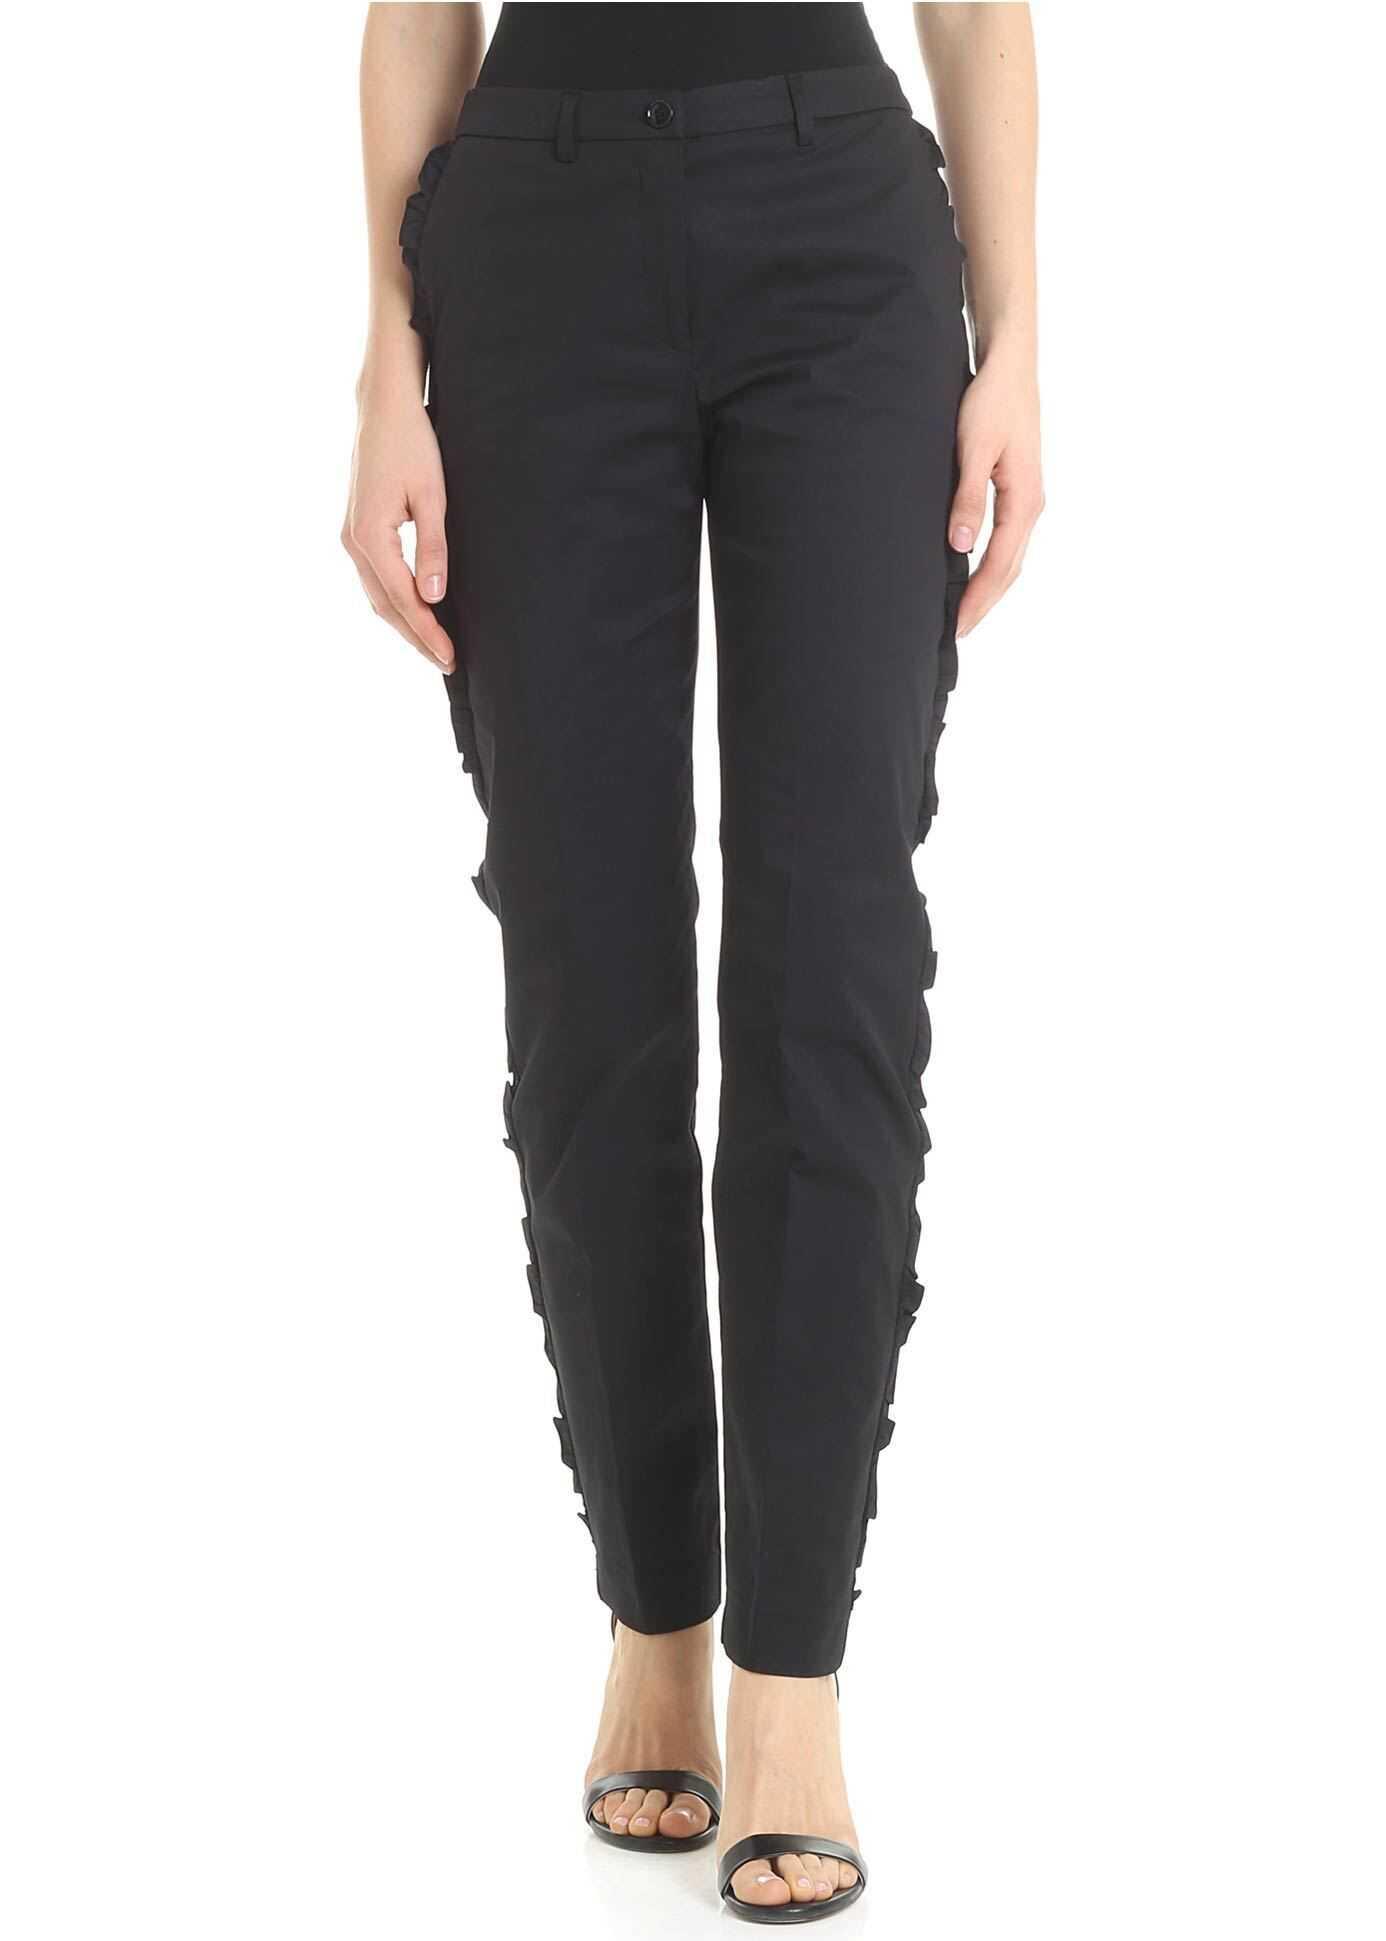 Blugirl Black Ruffled Trousers Black